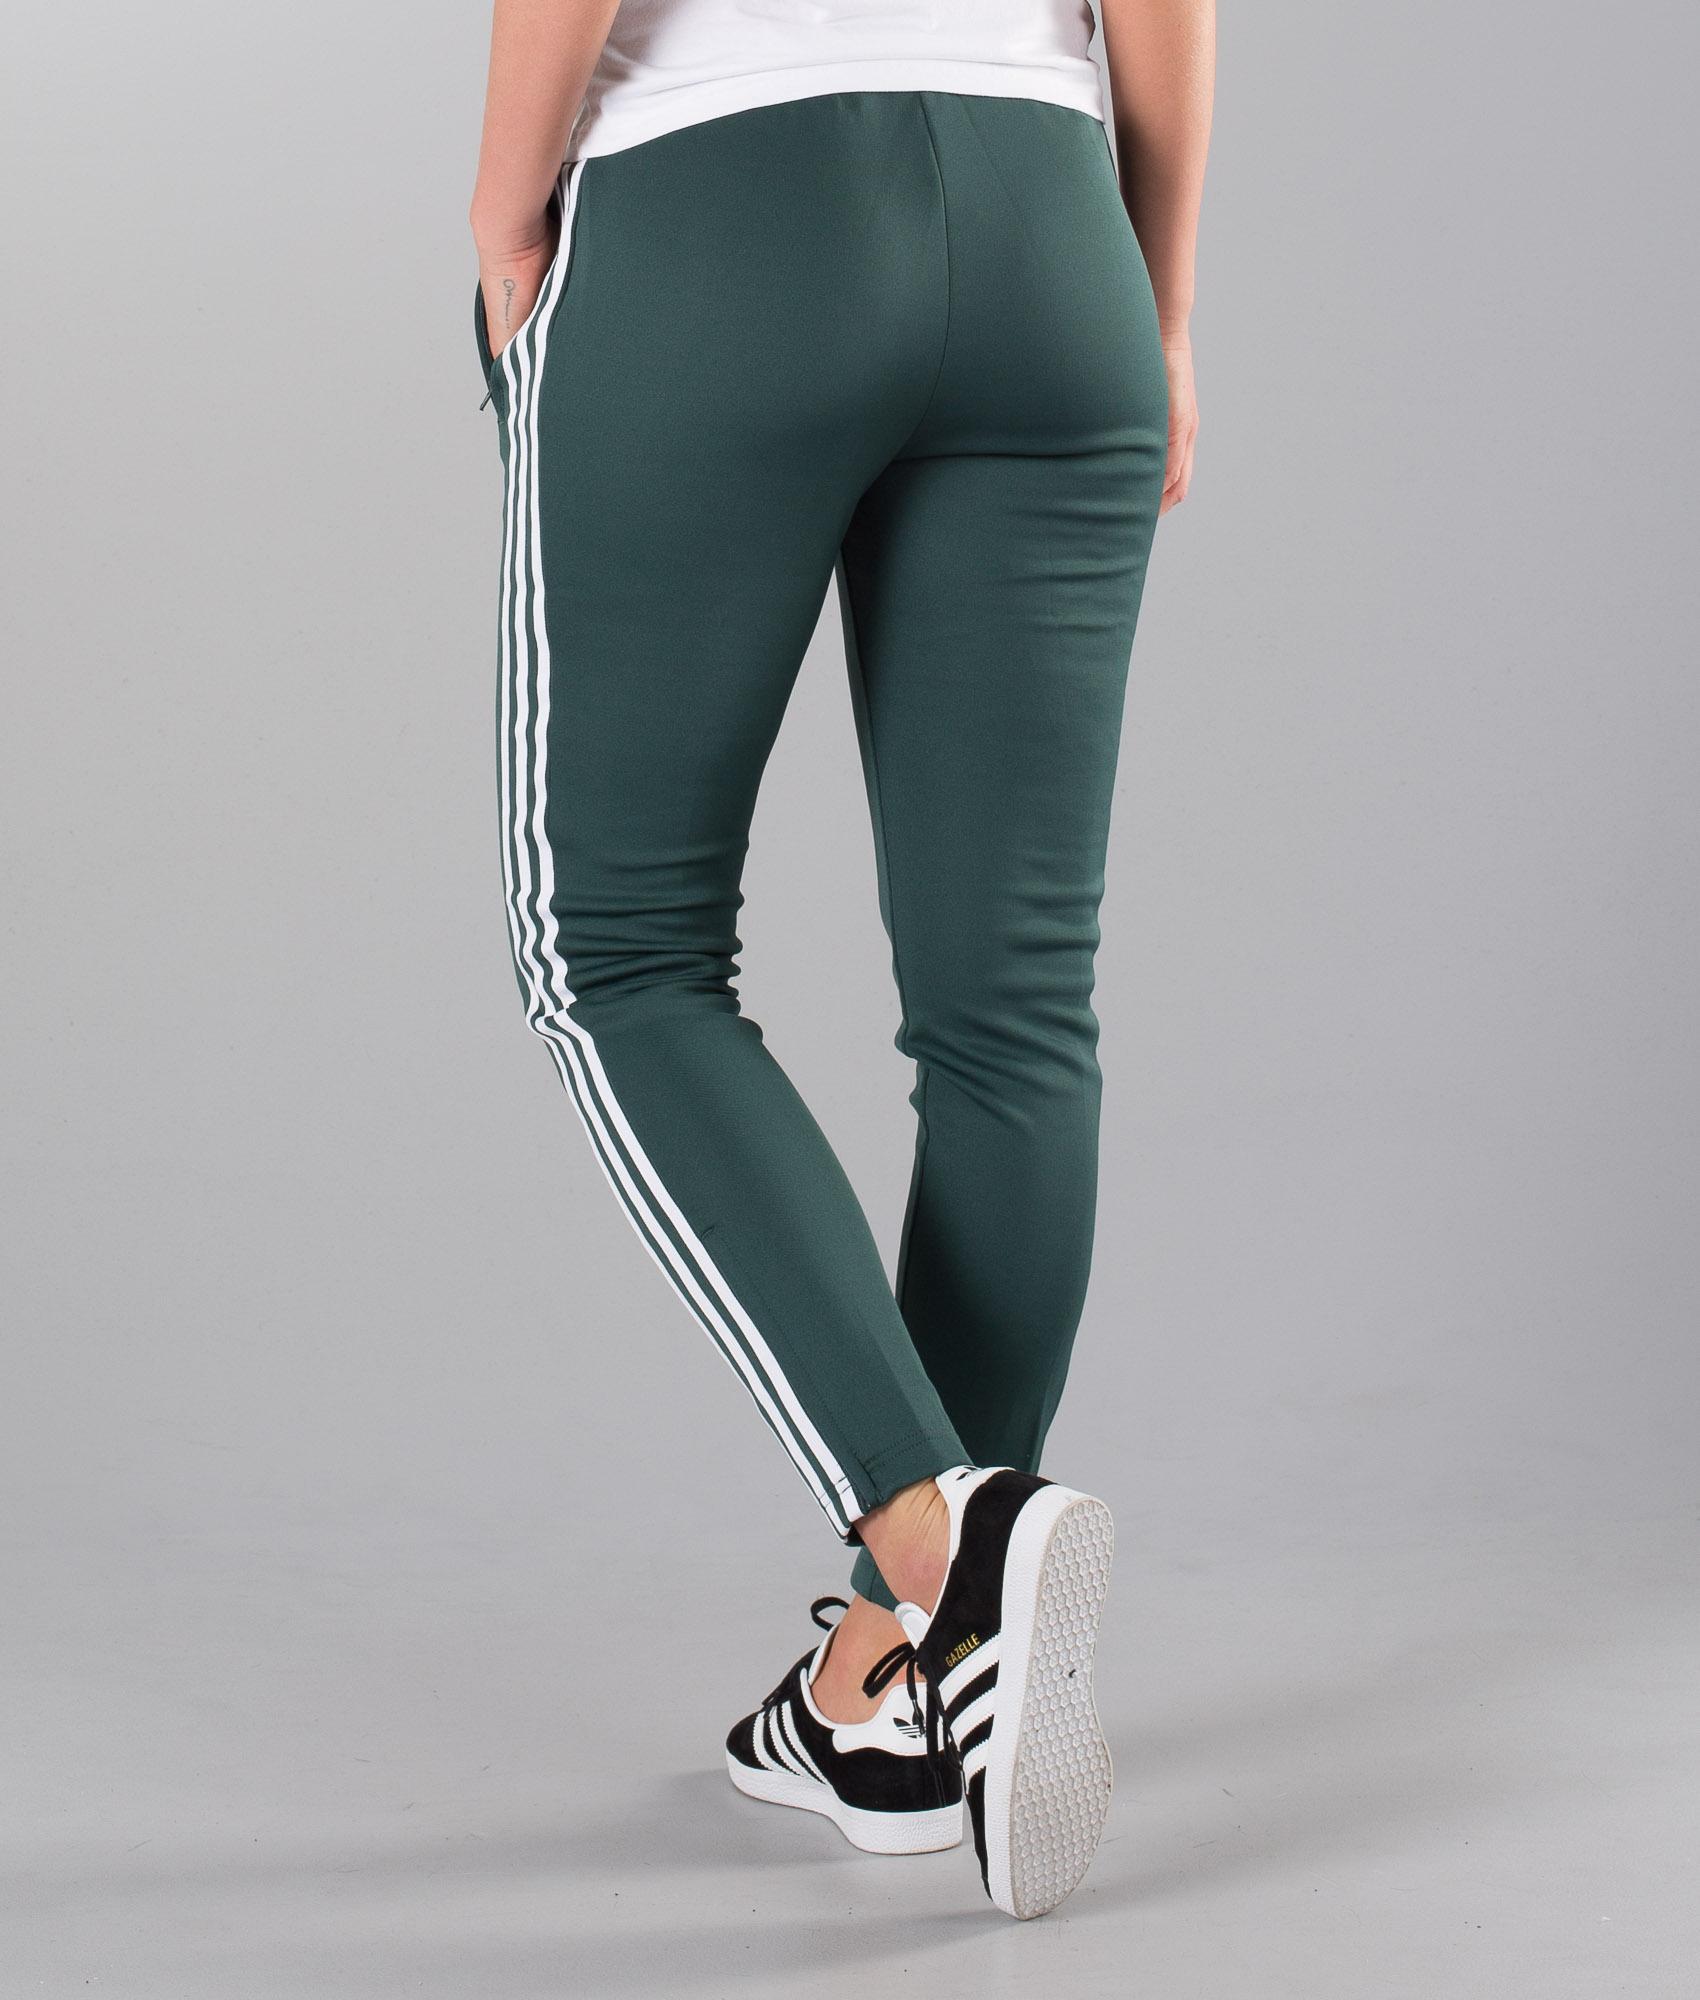 Originals Pants Sst Adidas Sst Originals Sst Pants Adidas Originals Adidas nwCqZOR0w